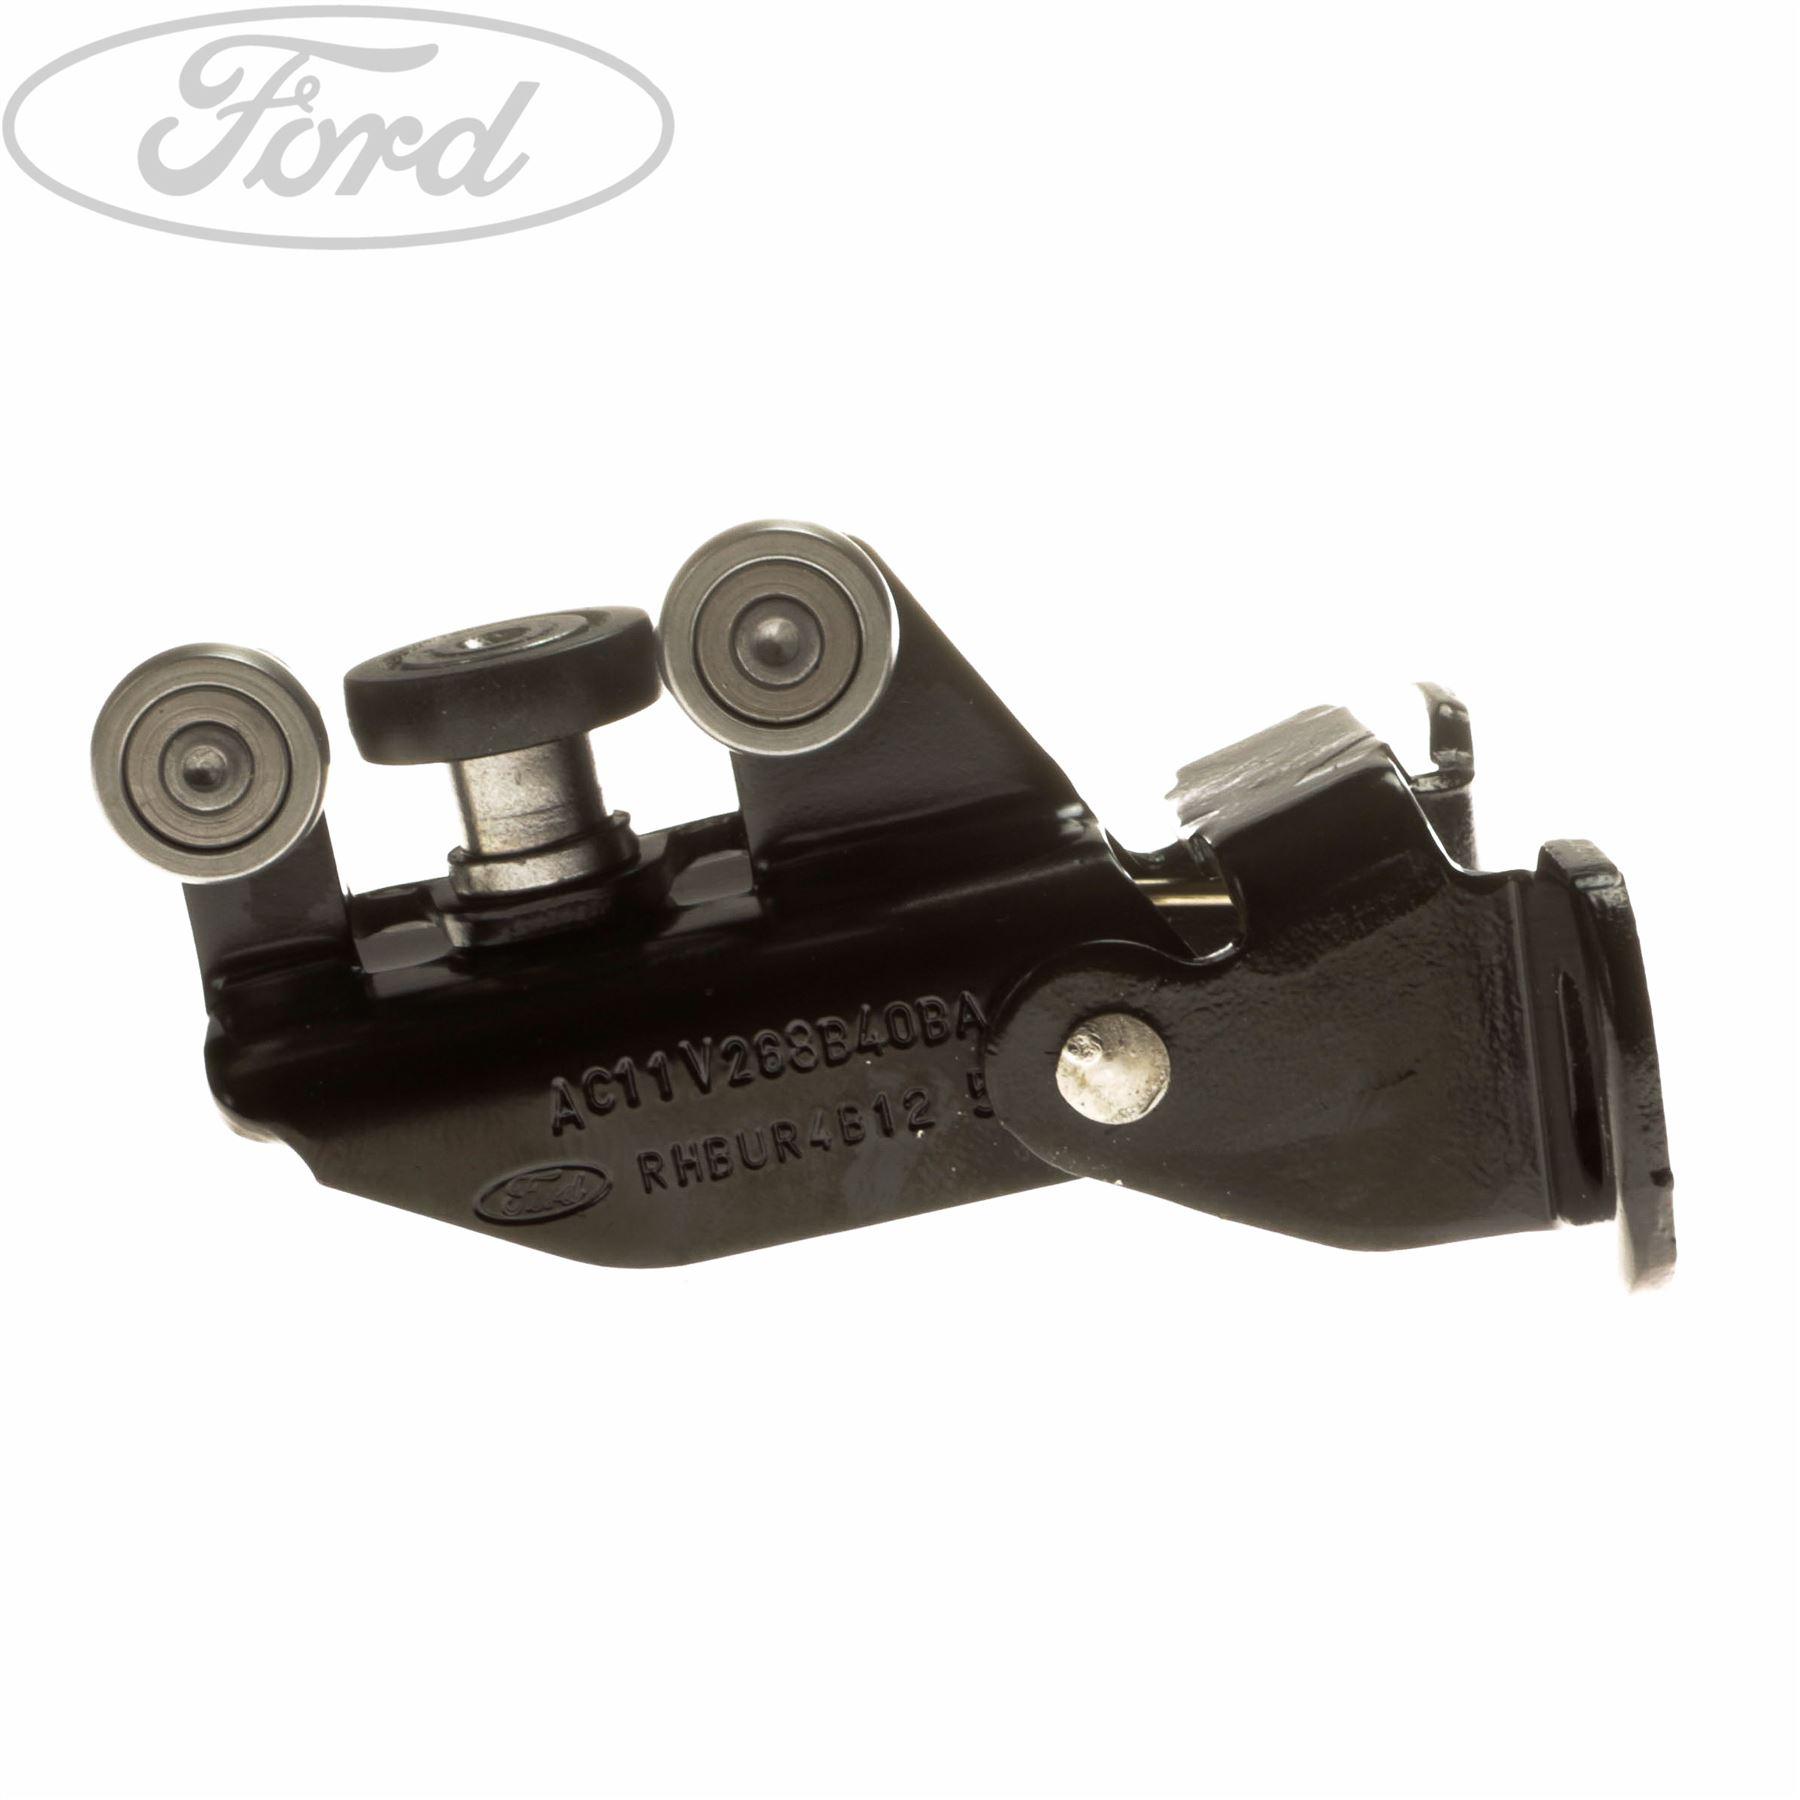 Ford Transit MK6 2.0 Di Genuine Comline Air Filter Engine Service Replacement